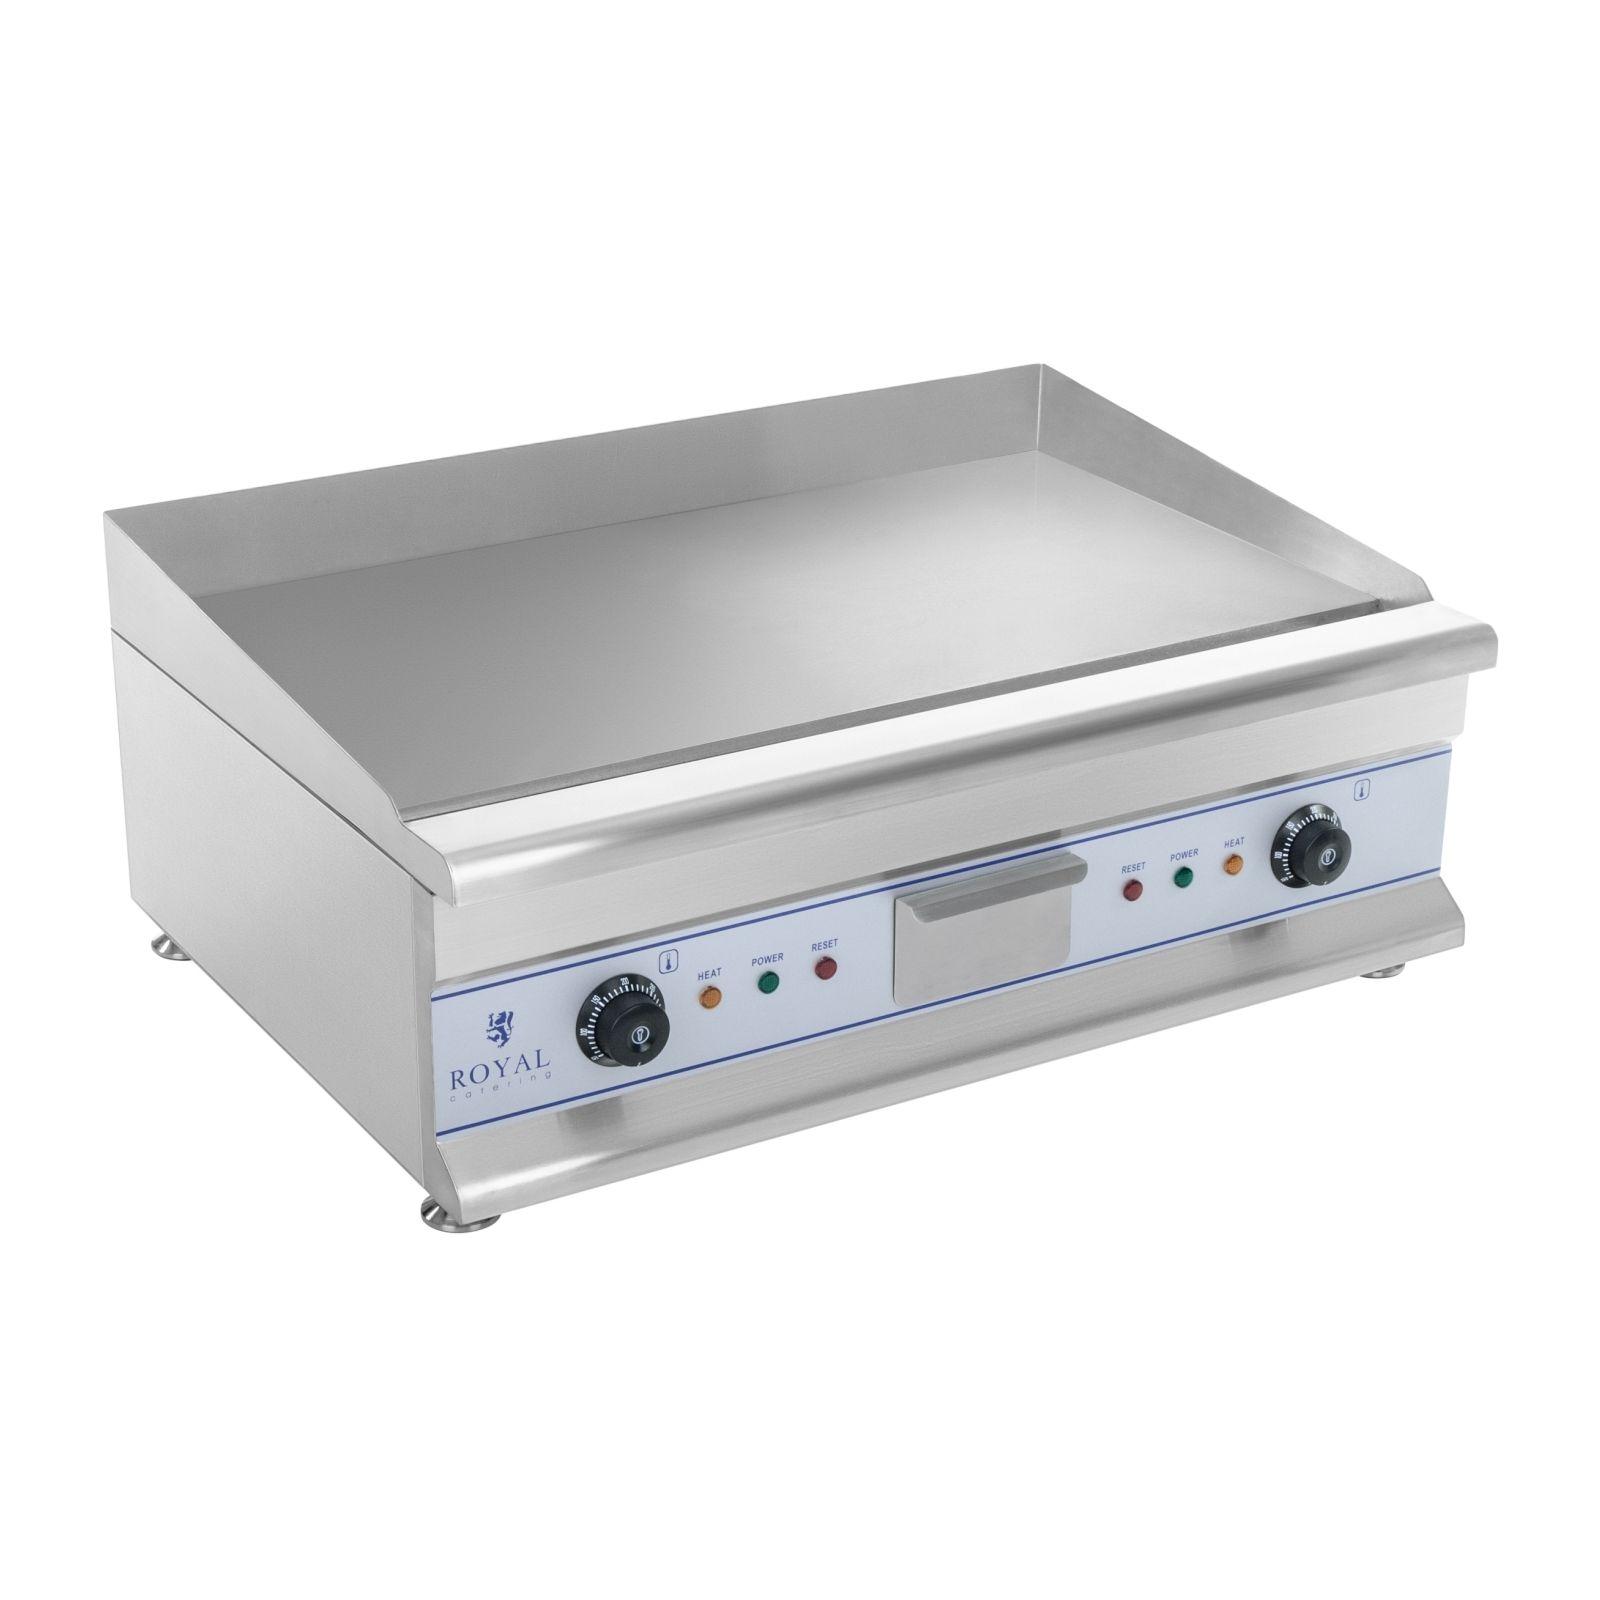 royal catering fry top liscio elettrico - 72,5 cm - liscio - 2 x 3.2 kw rcg 75h